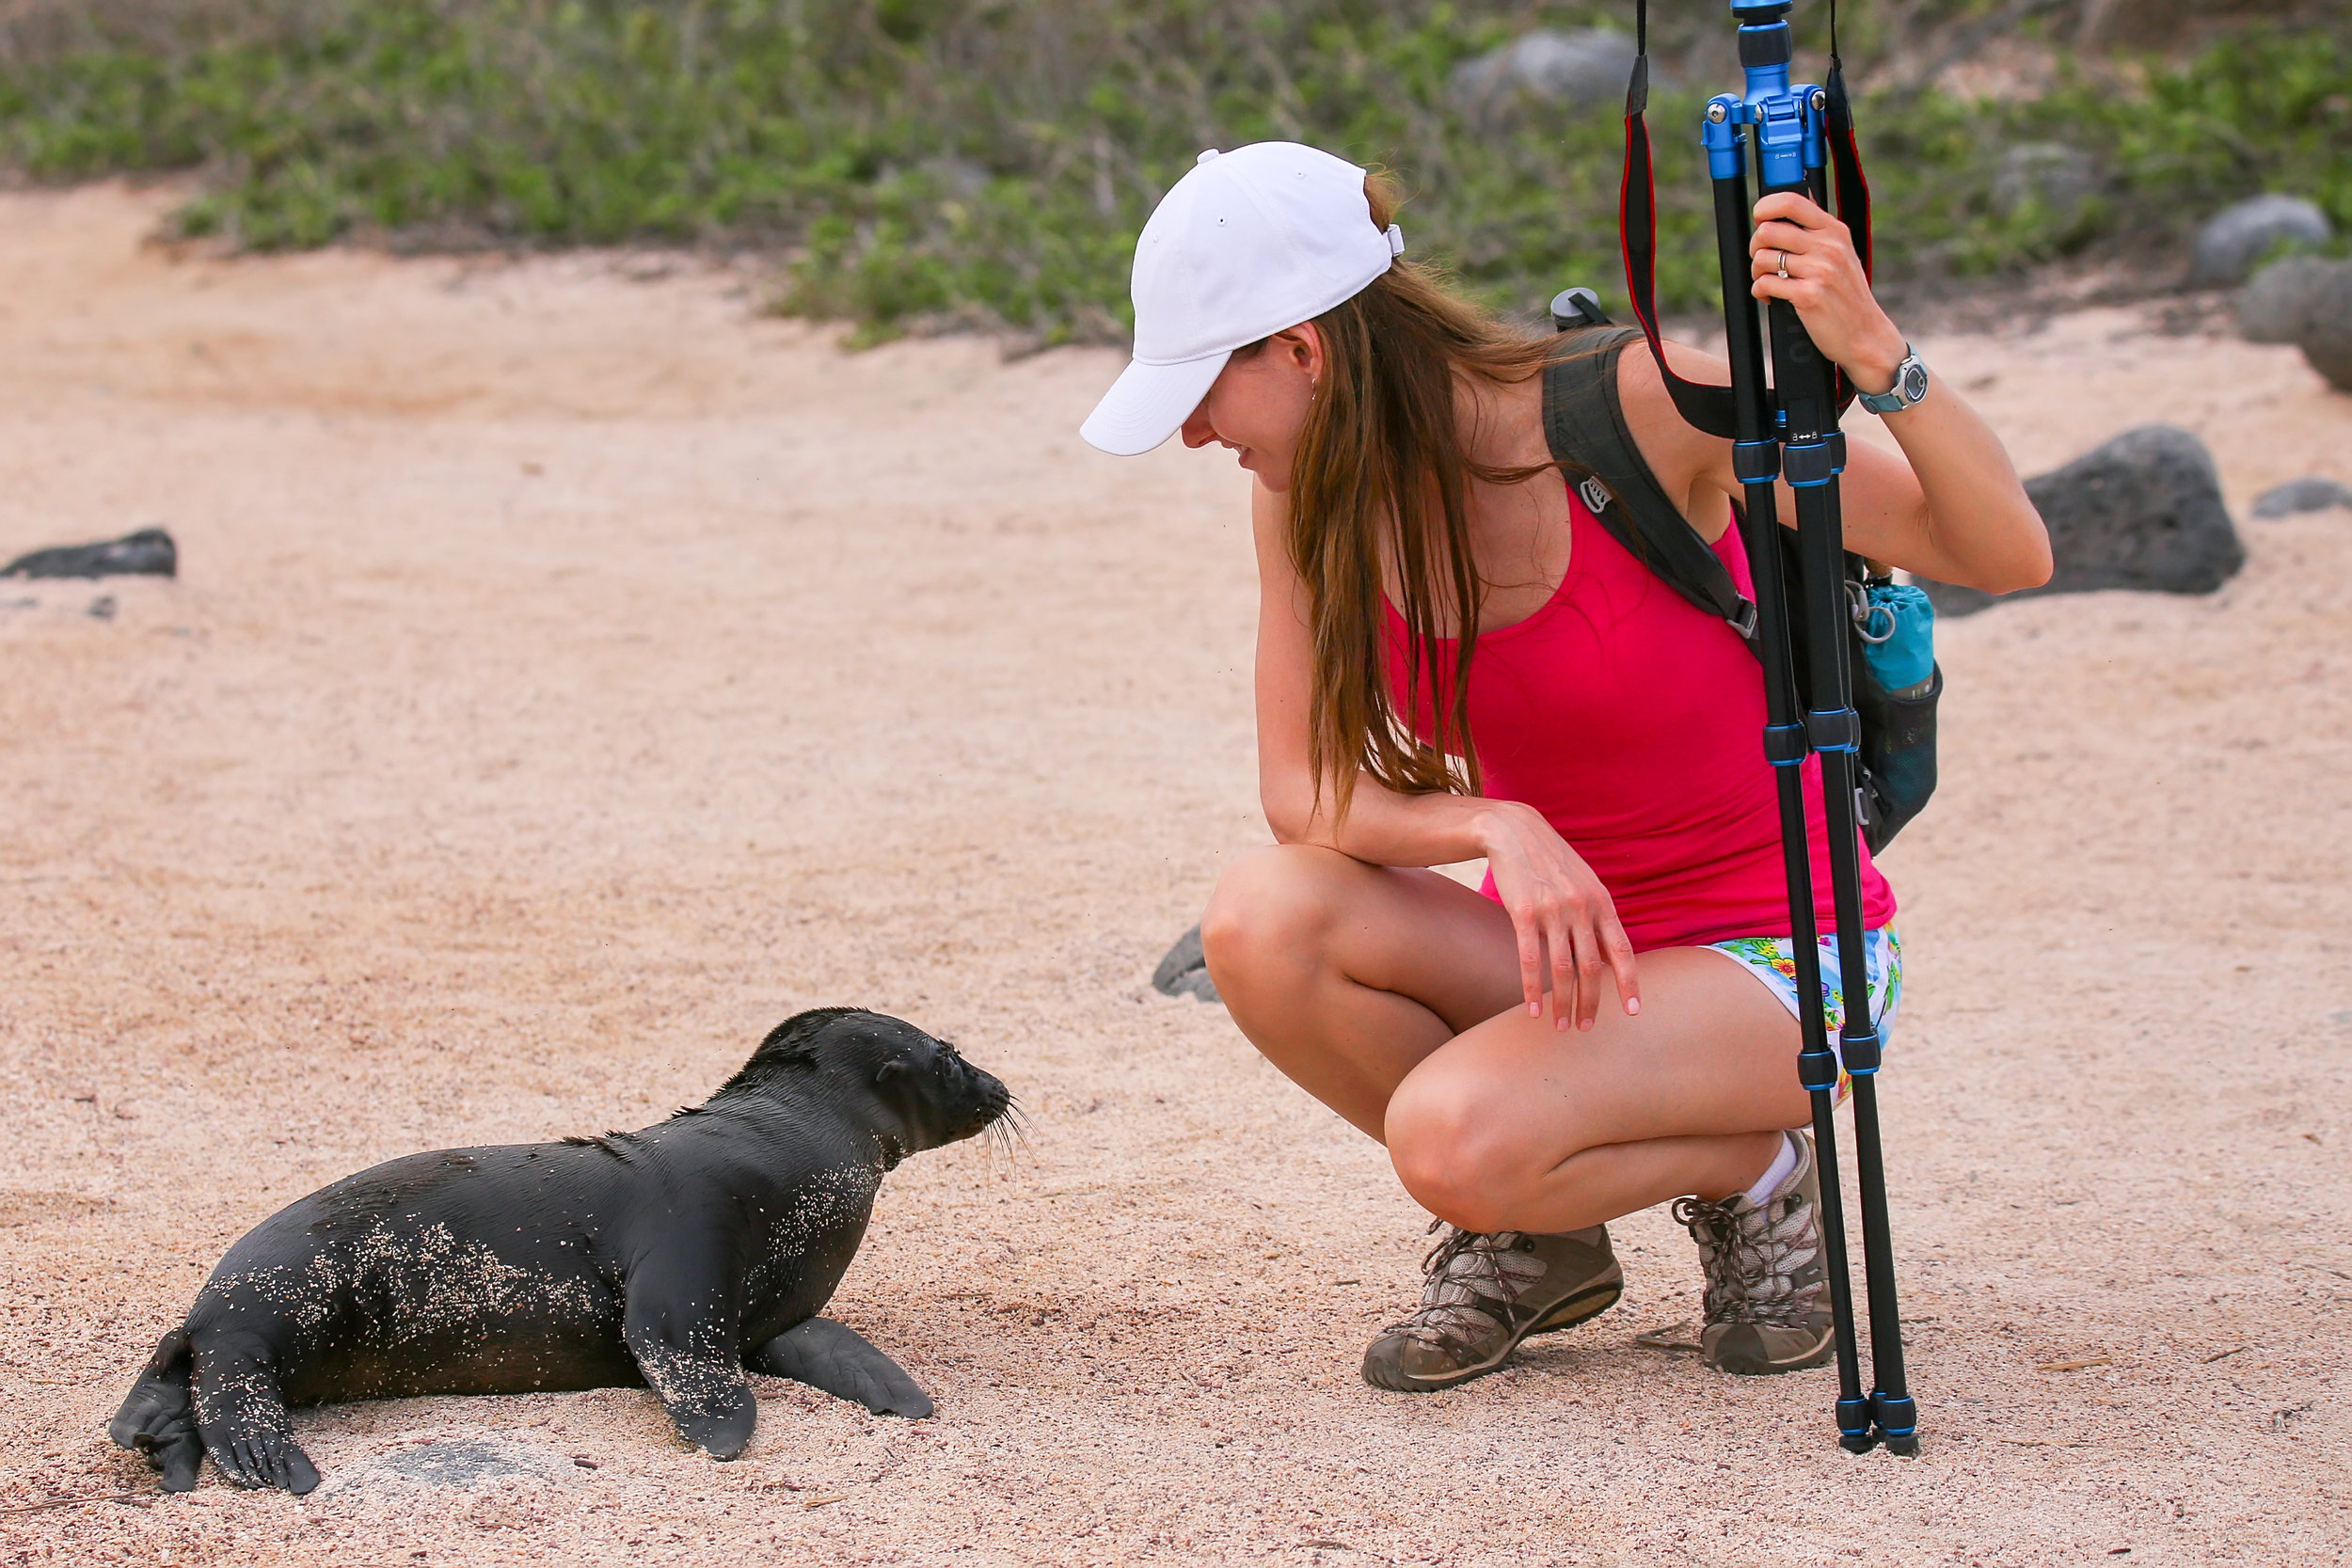 galapagos_bigstock-Baby-Galapagos-Sea-Lion-Lookin-119577878.jpg